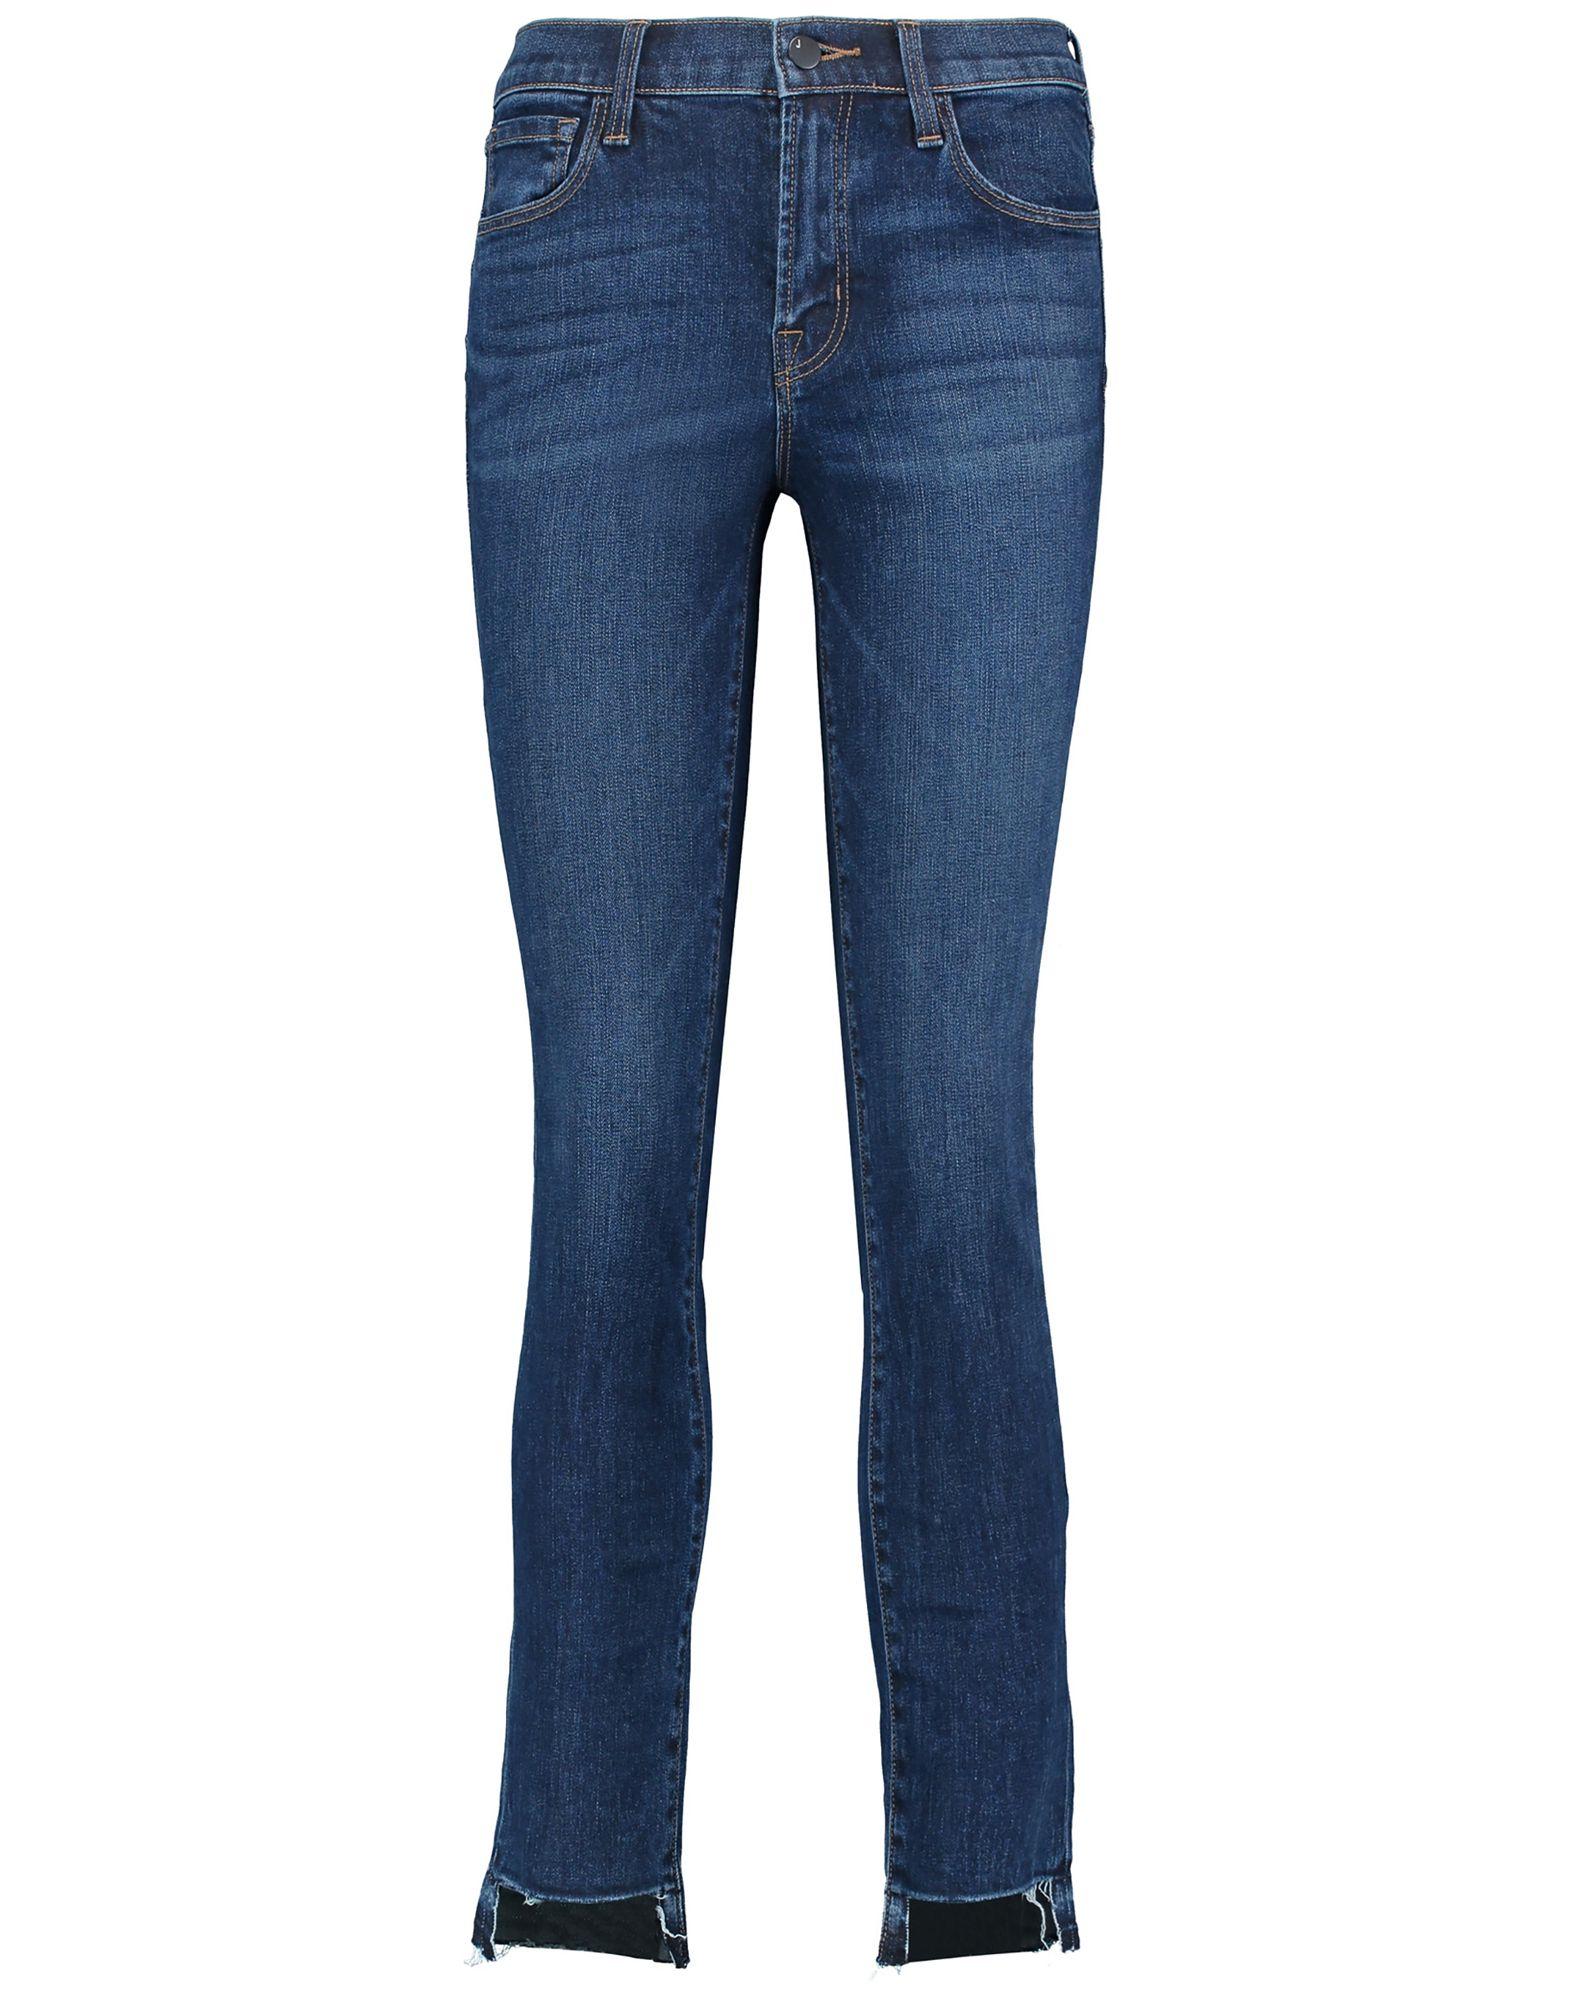 J BRAND Джинсовые брюки button design mid waist skinny jeans